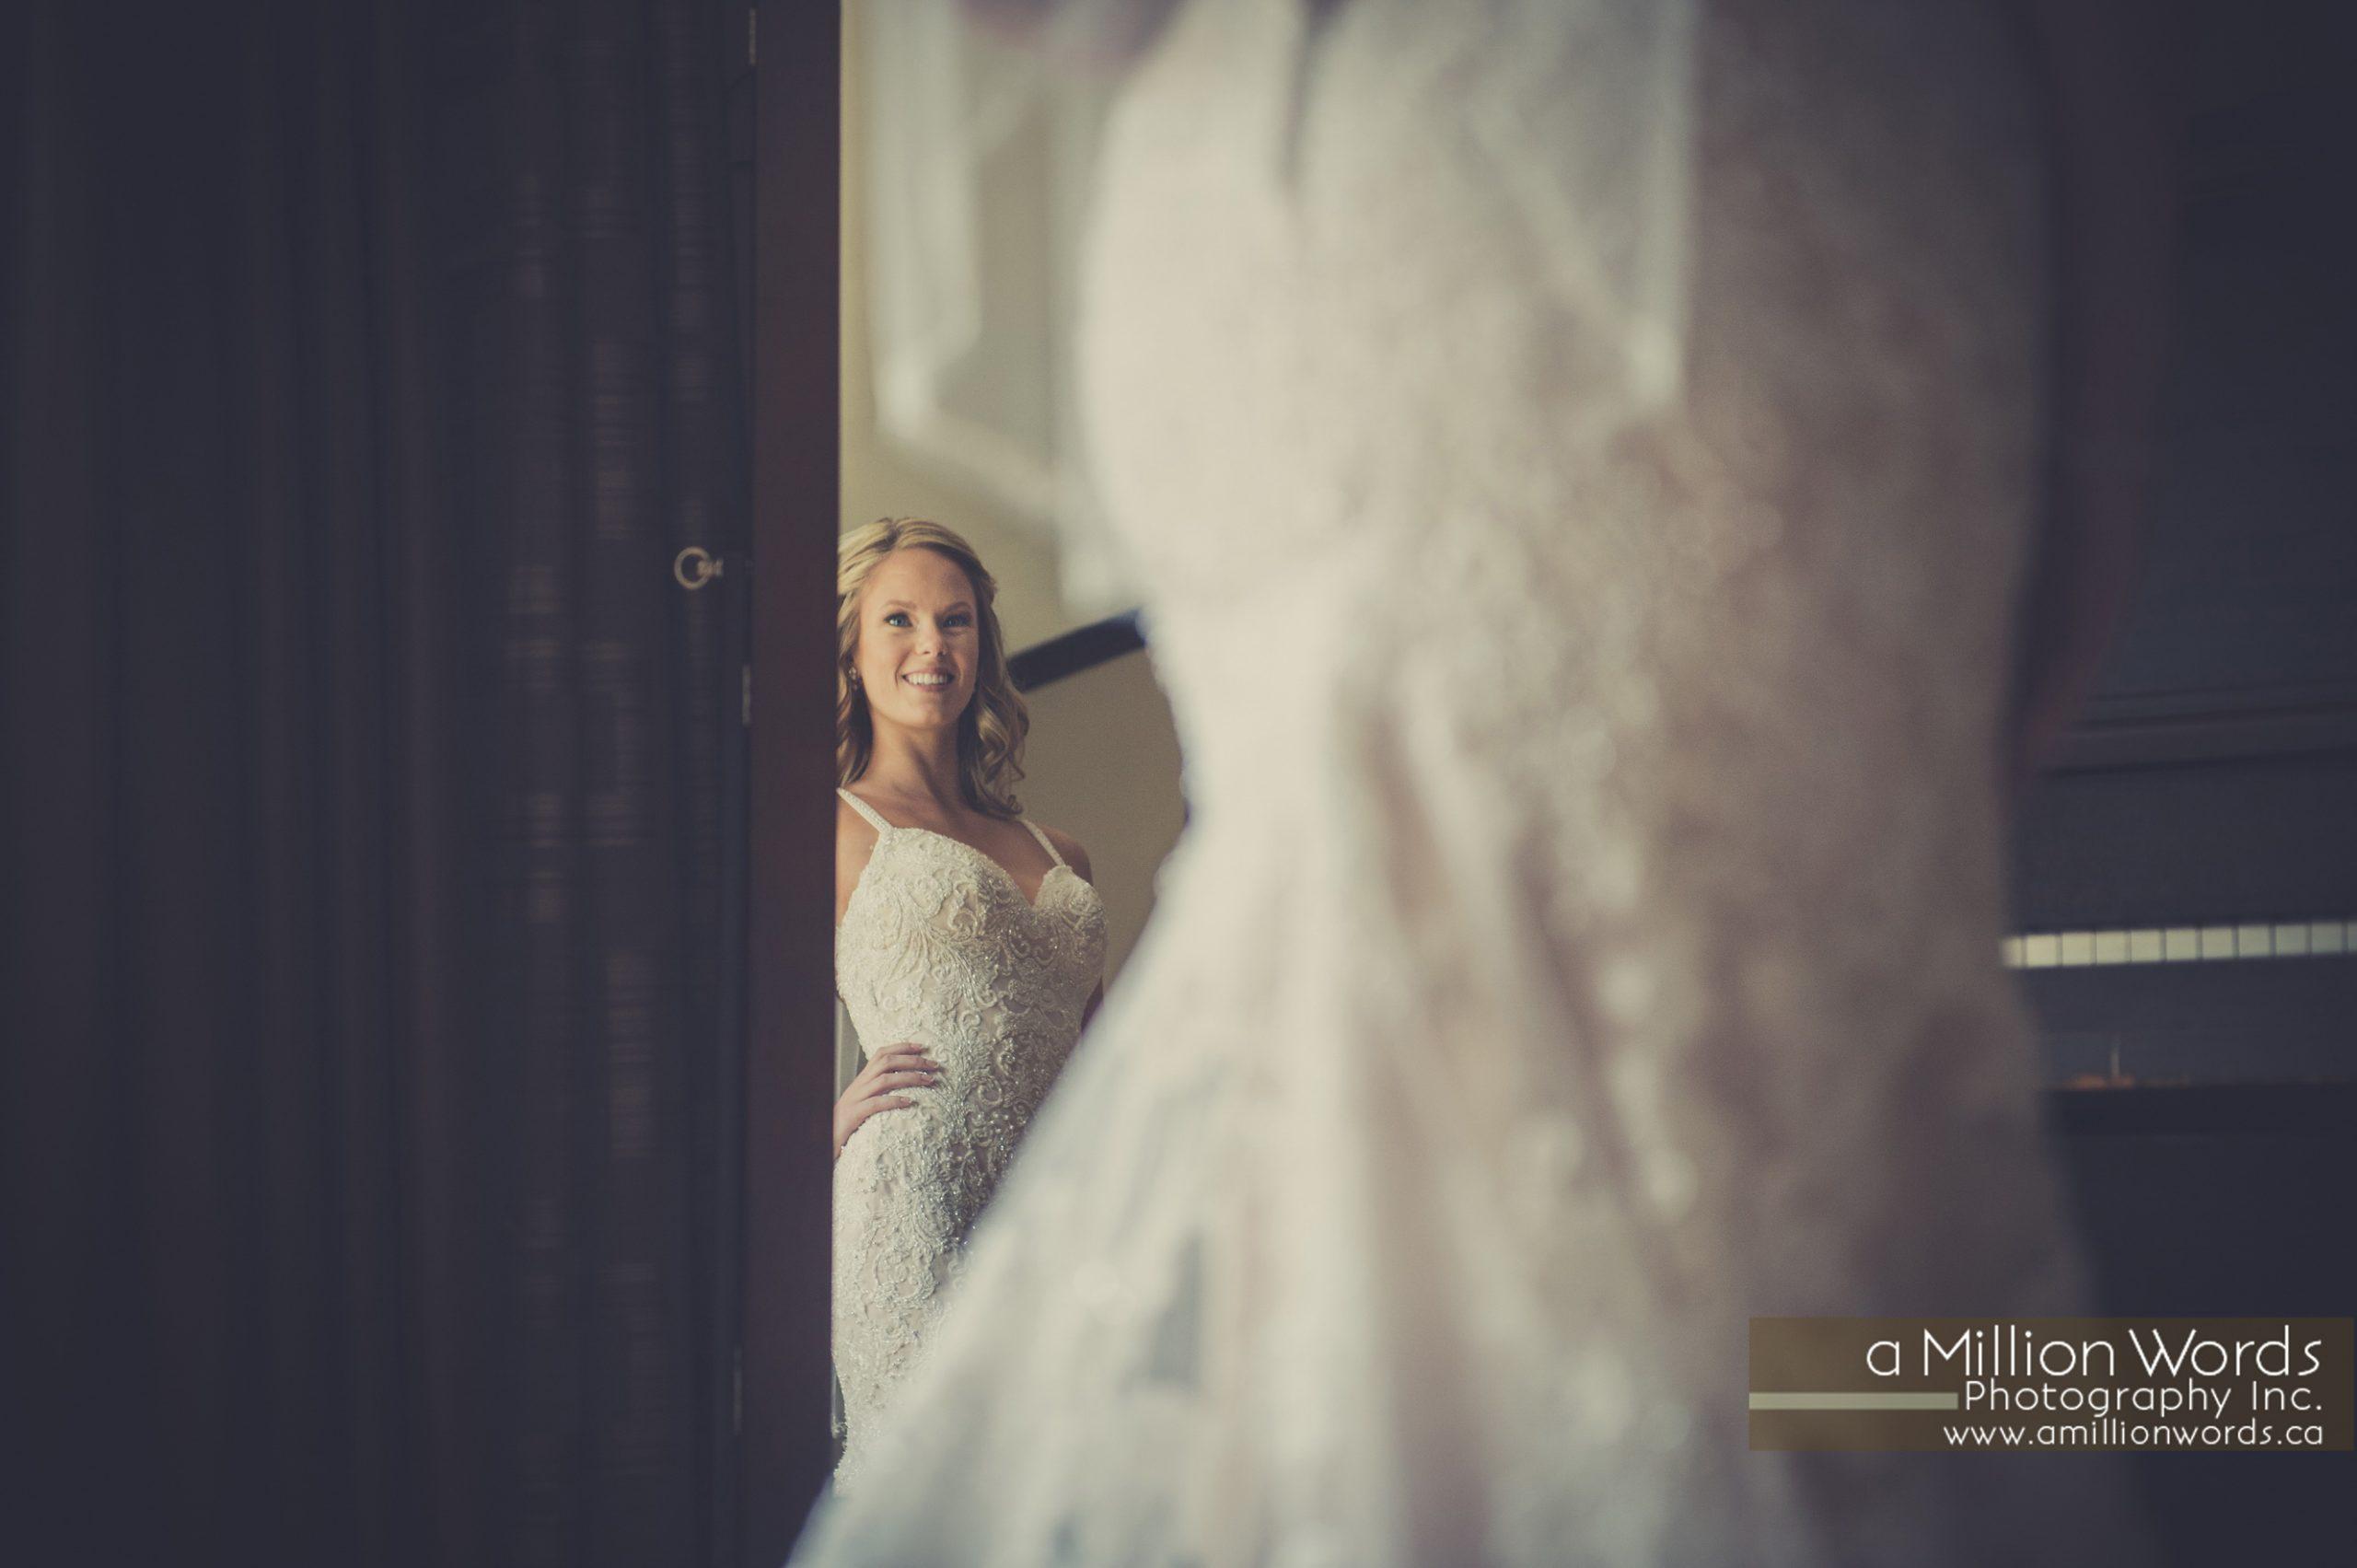 arthur_wedding_photographer18